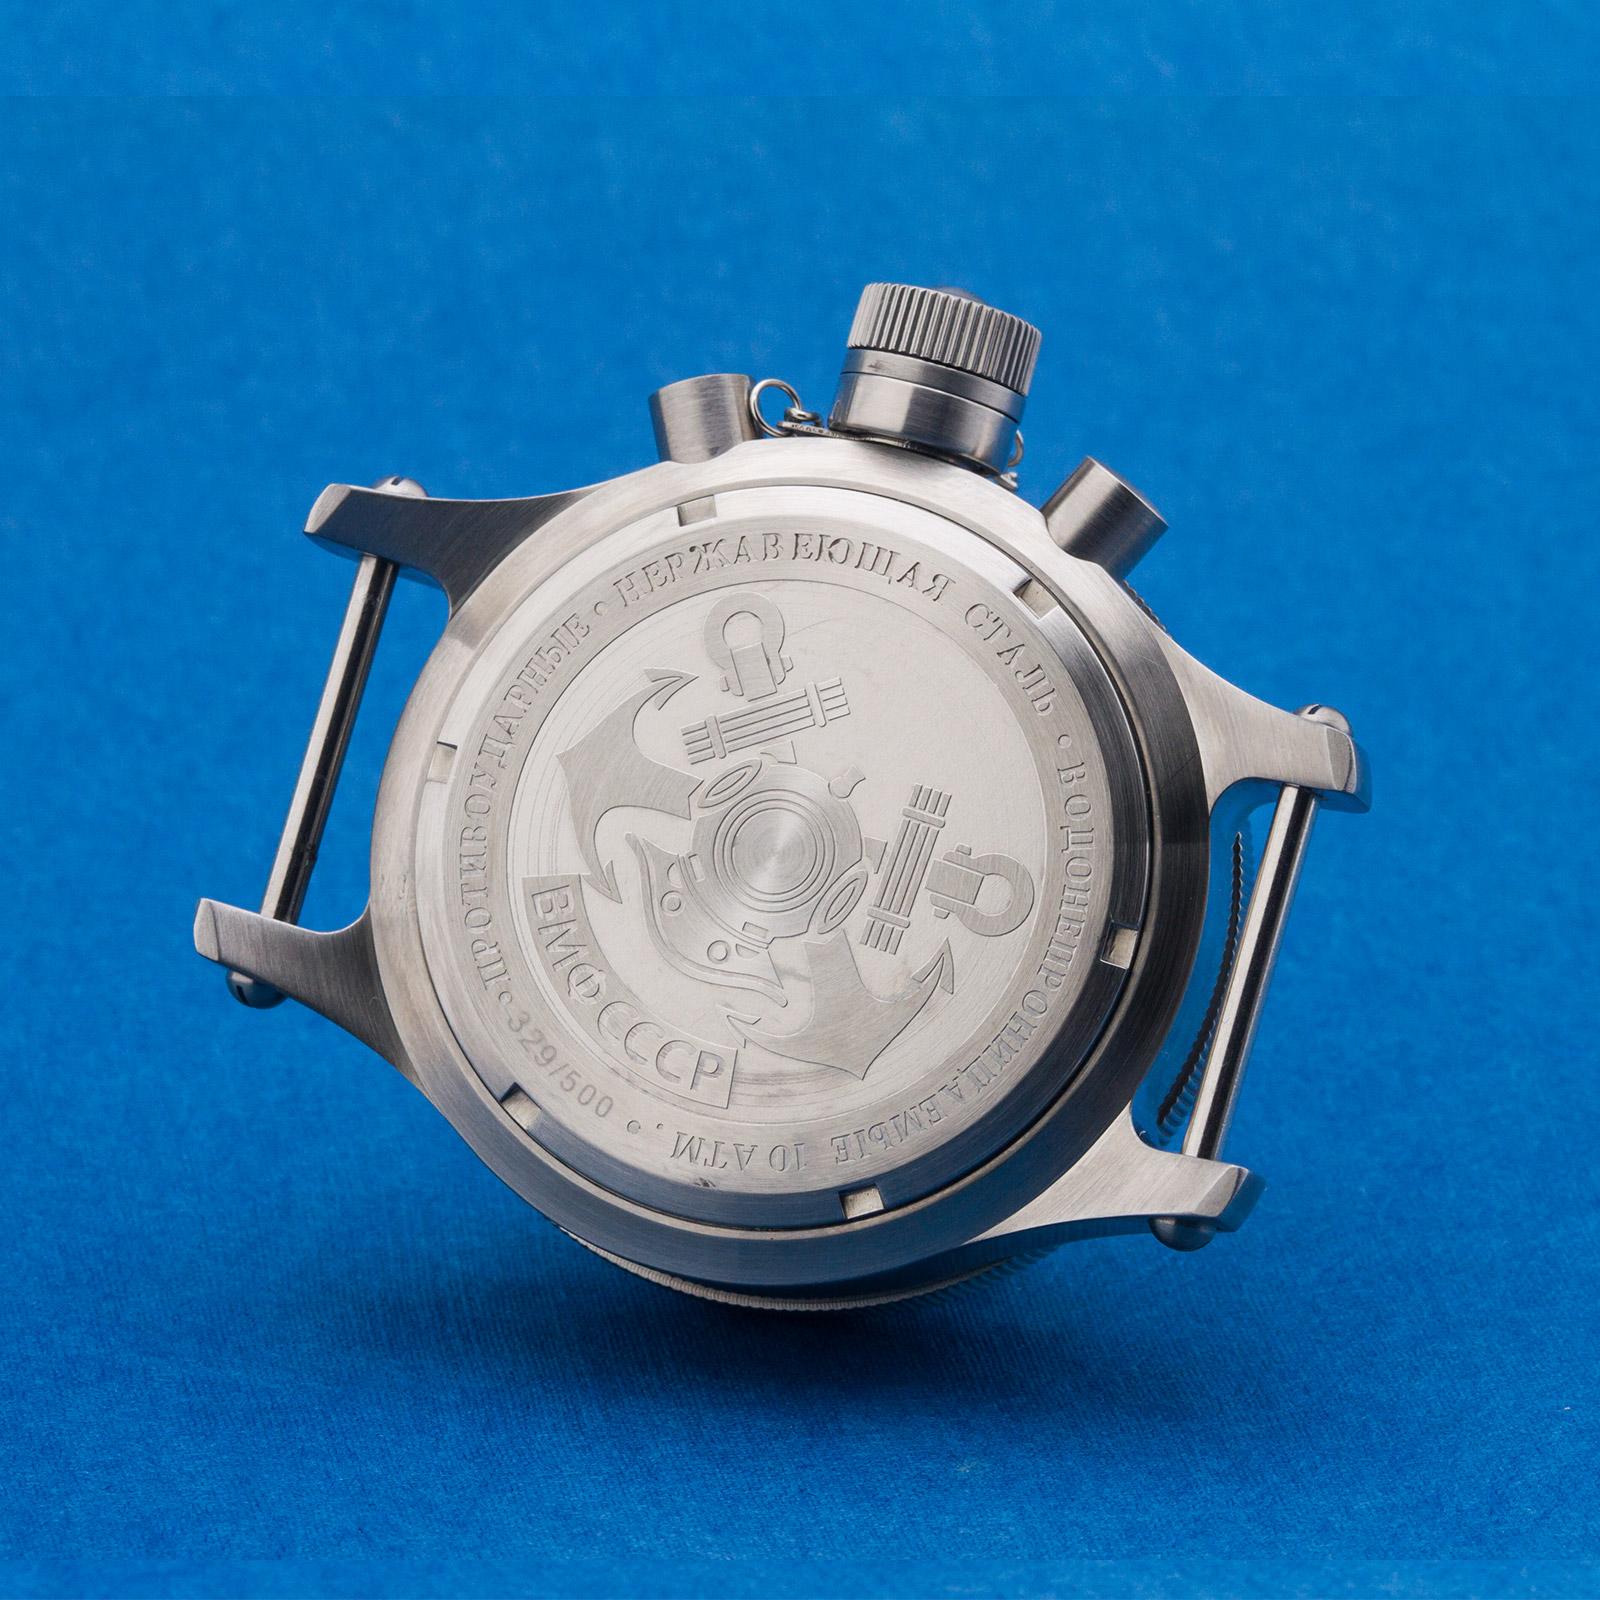 Taucheruhr-POLJOT-Edelstahl-Gehaeuse-Uhrengehaeuse-Diver-watch-case-mvm-3133-31681 Indexbild 7